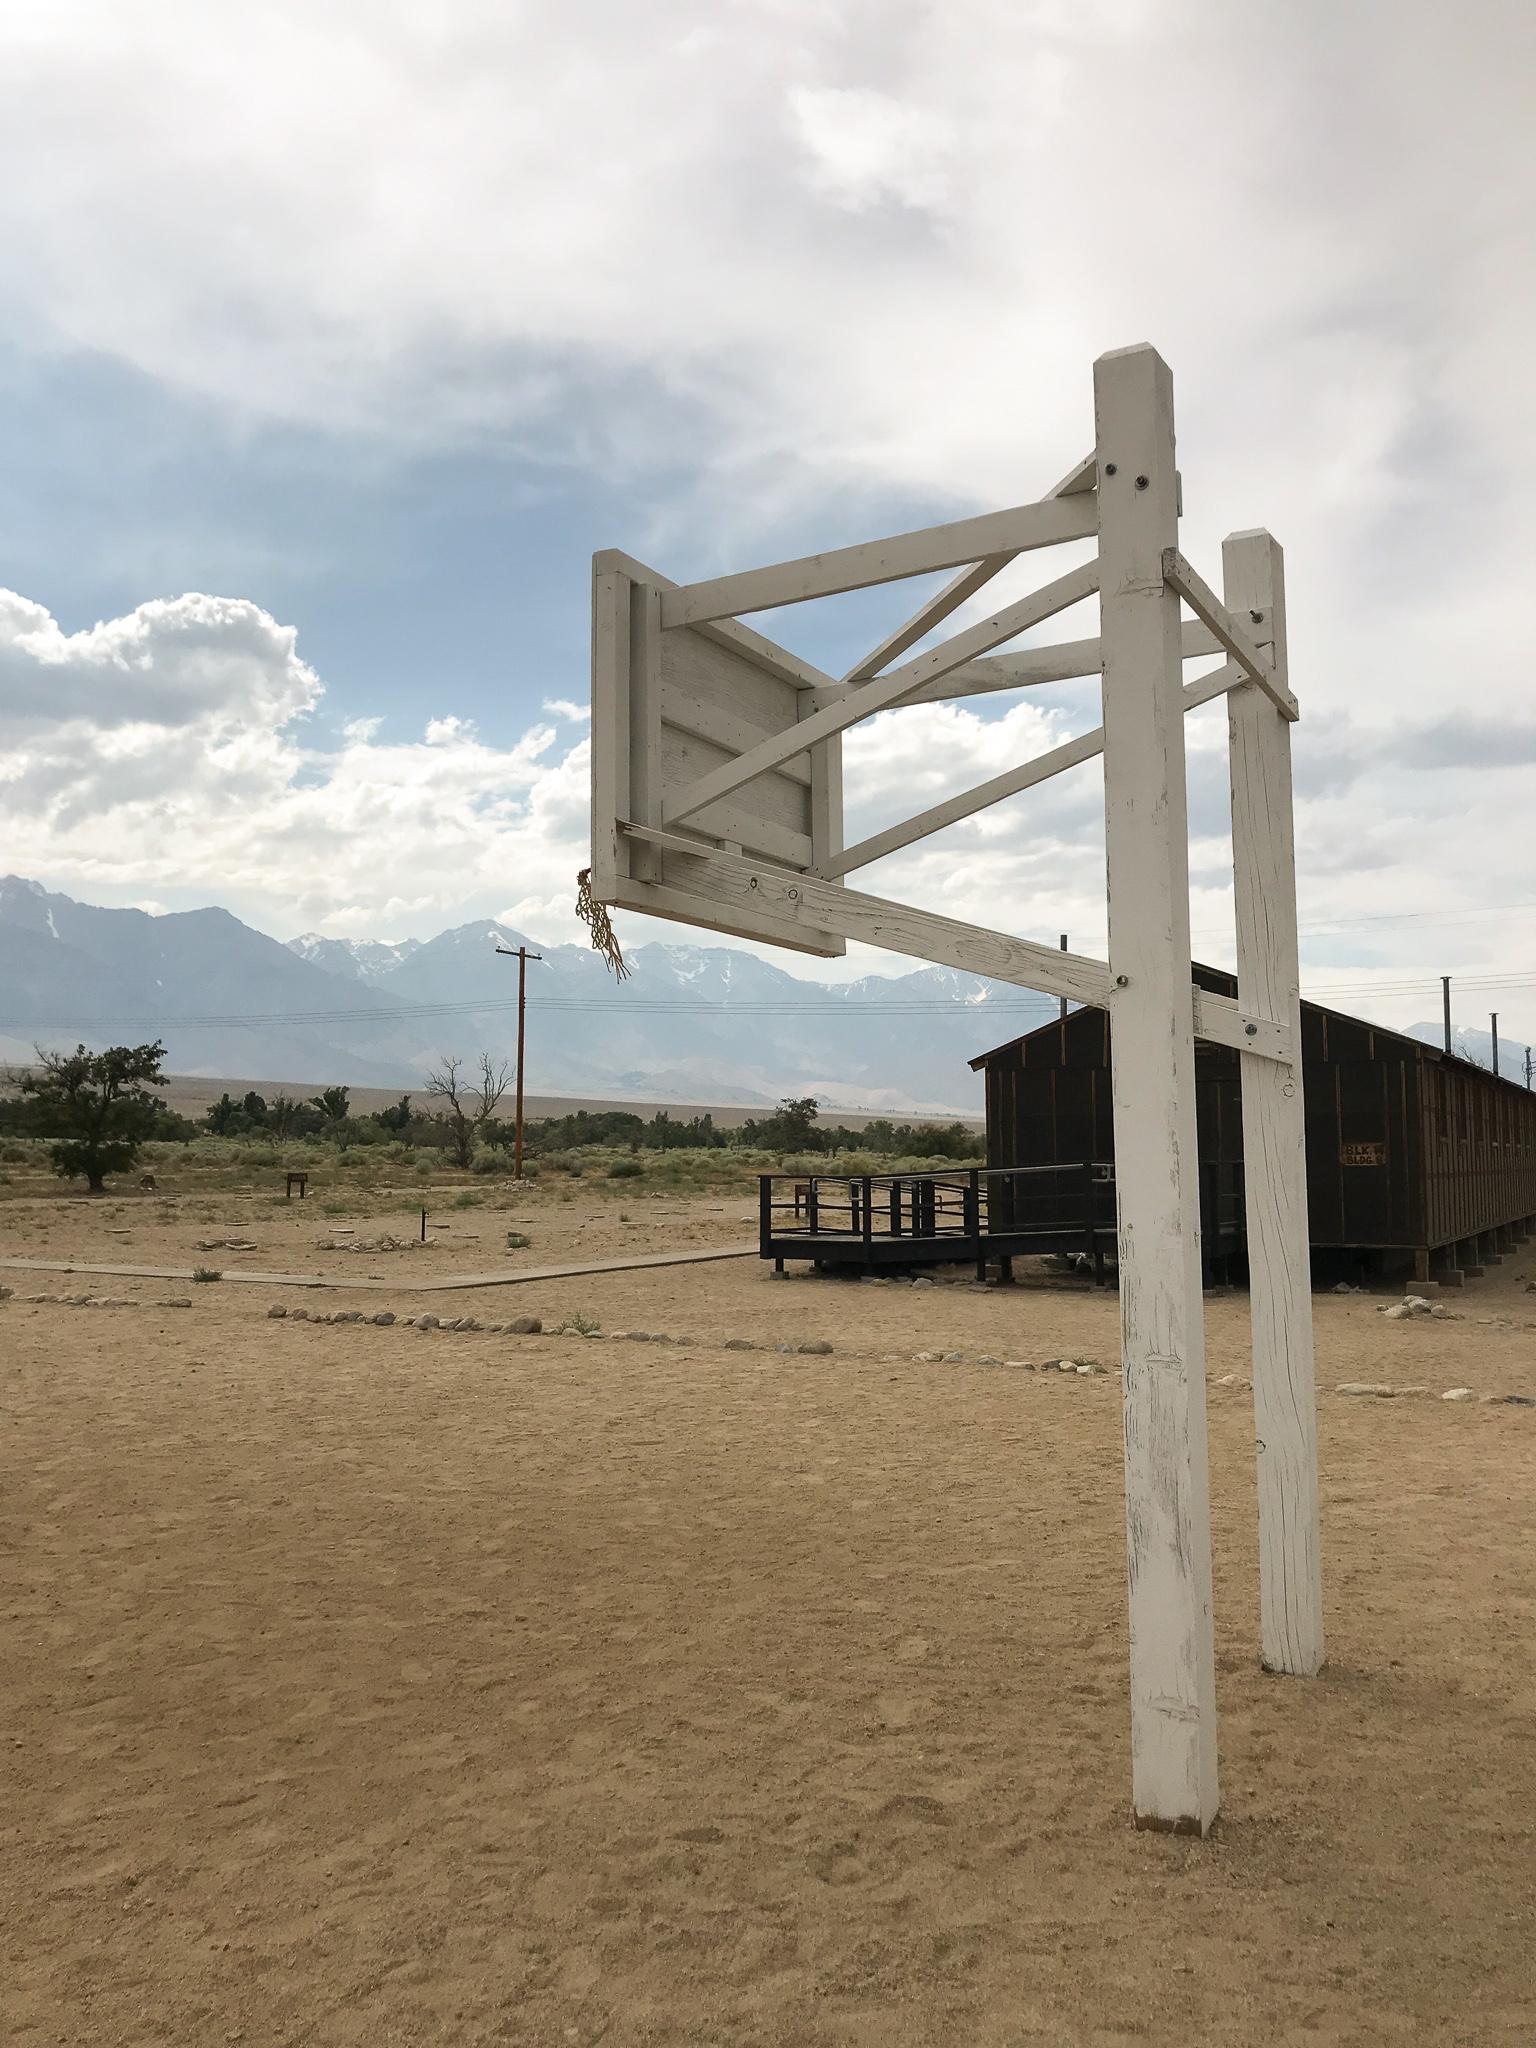 Interesting historic basketball court